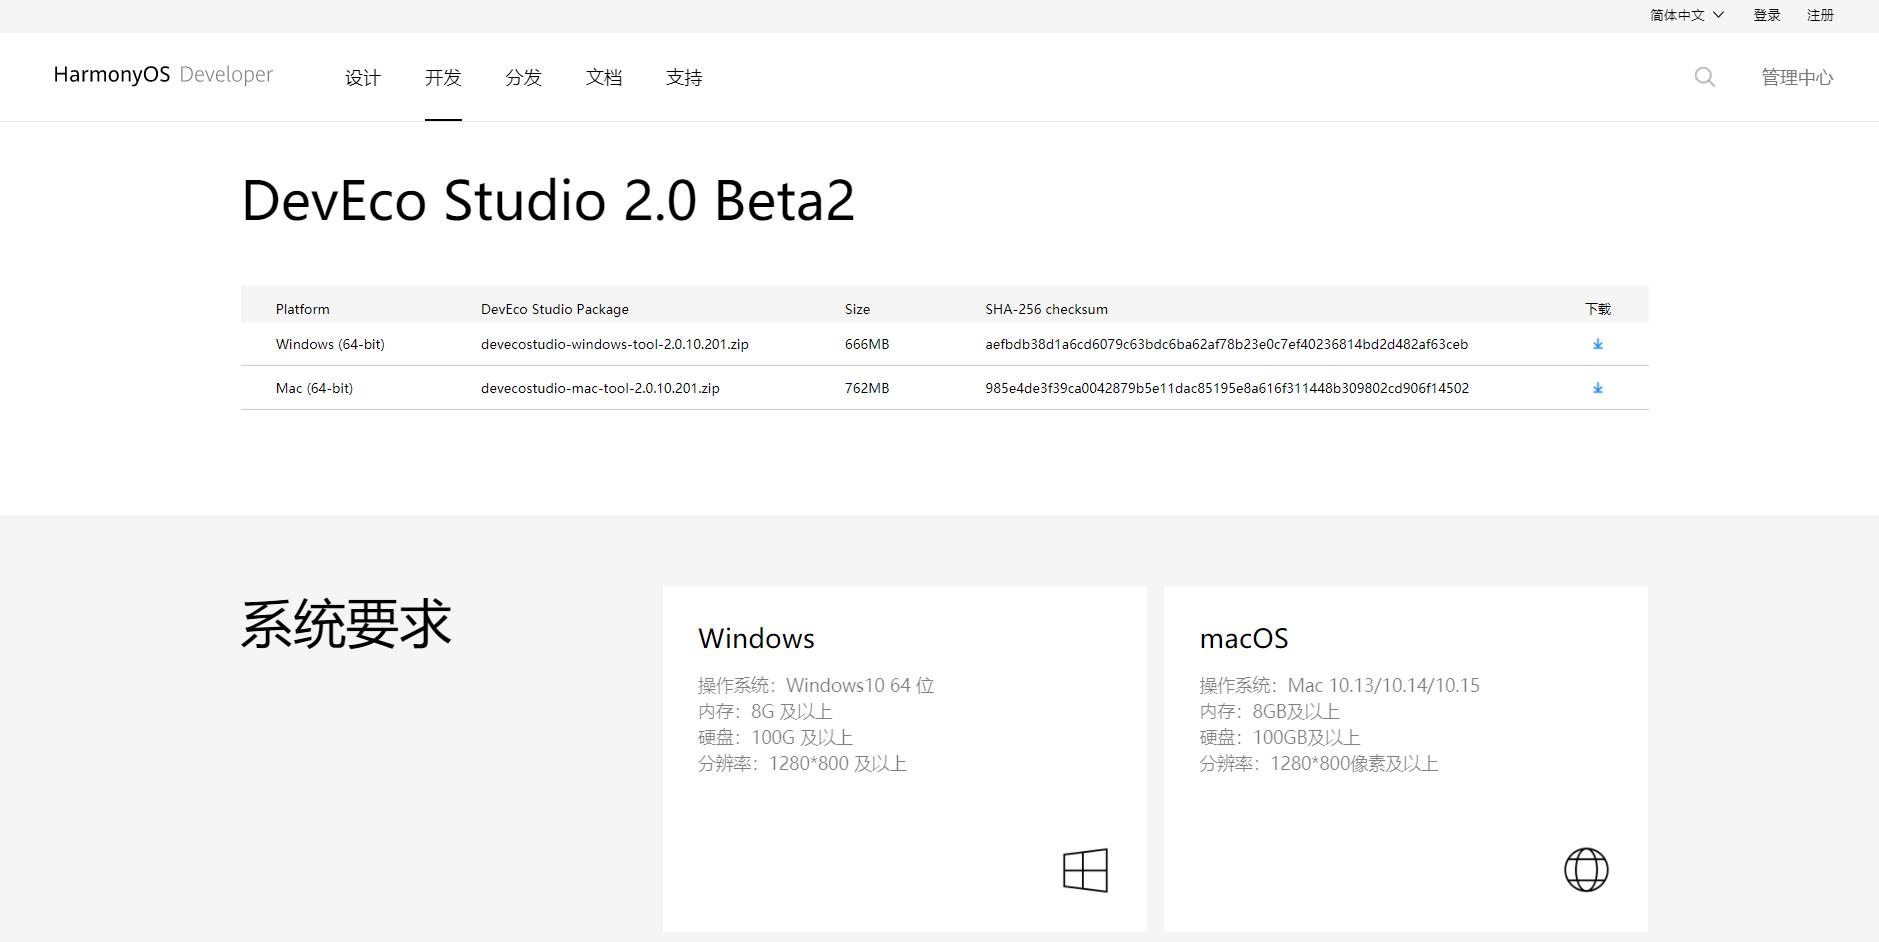 DevEco Studio 2.0 Beta2 邀你升级,开发HarmonyOS应用更进一步